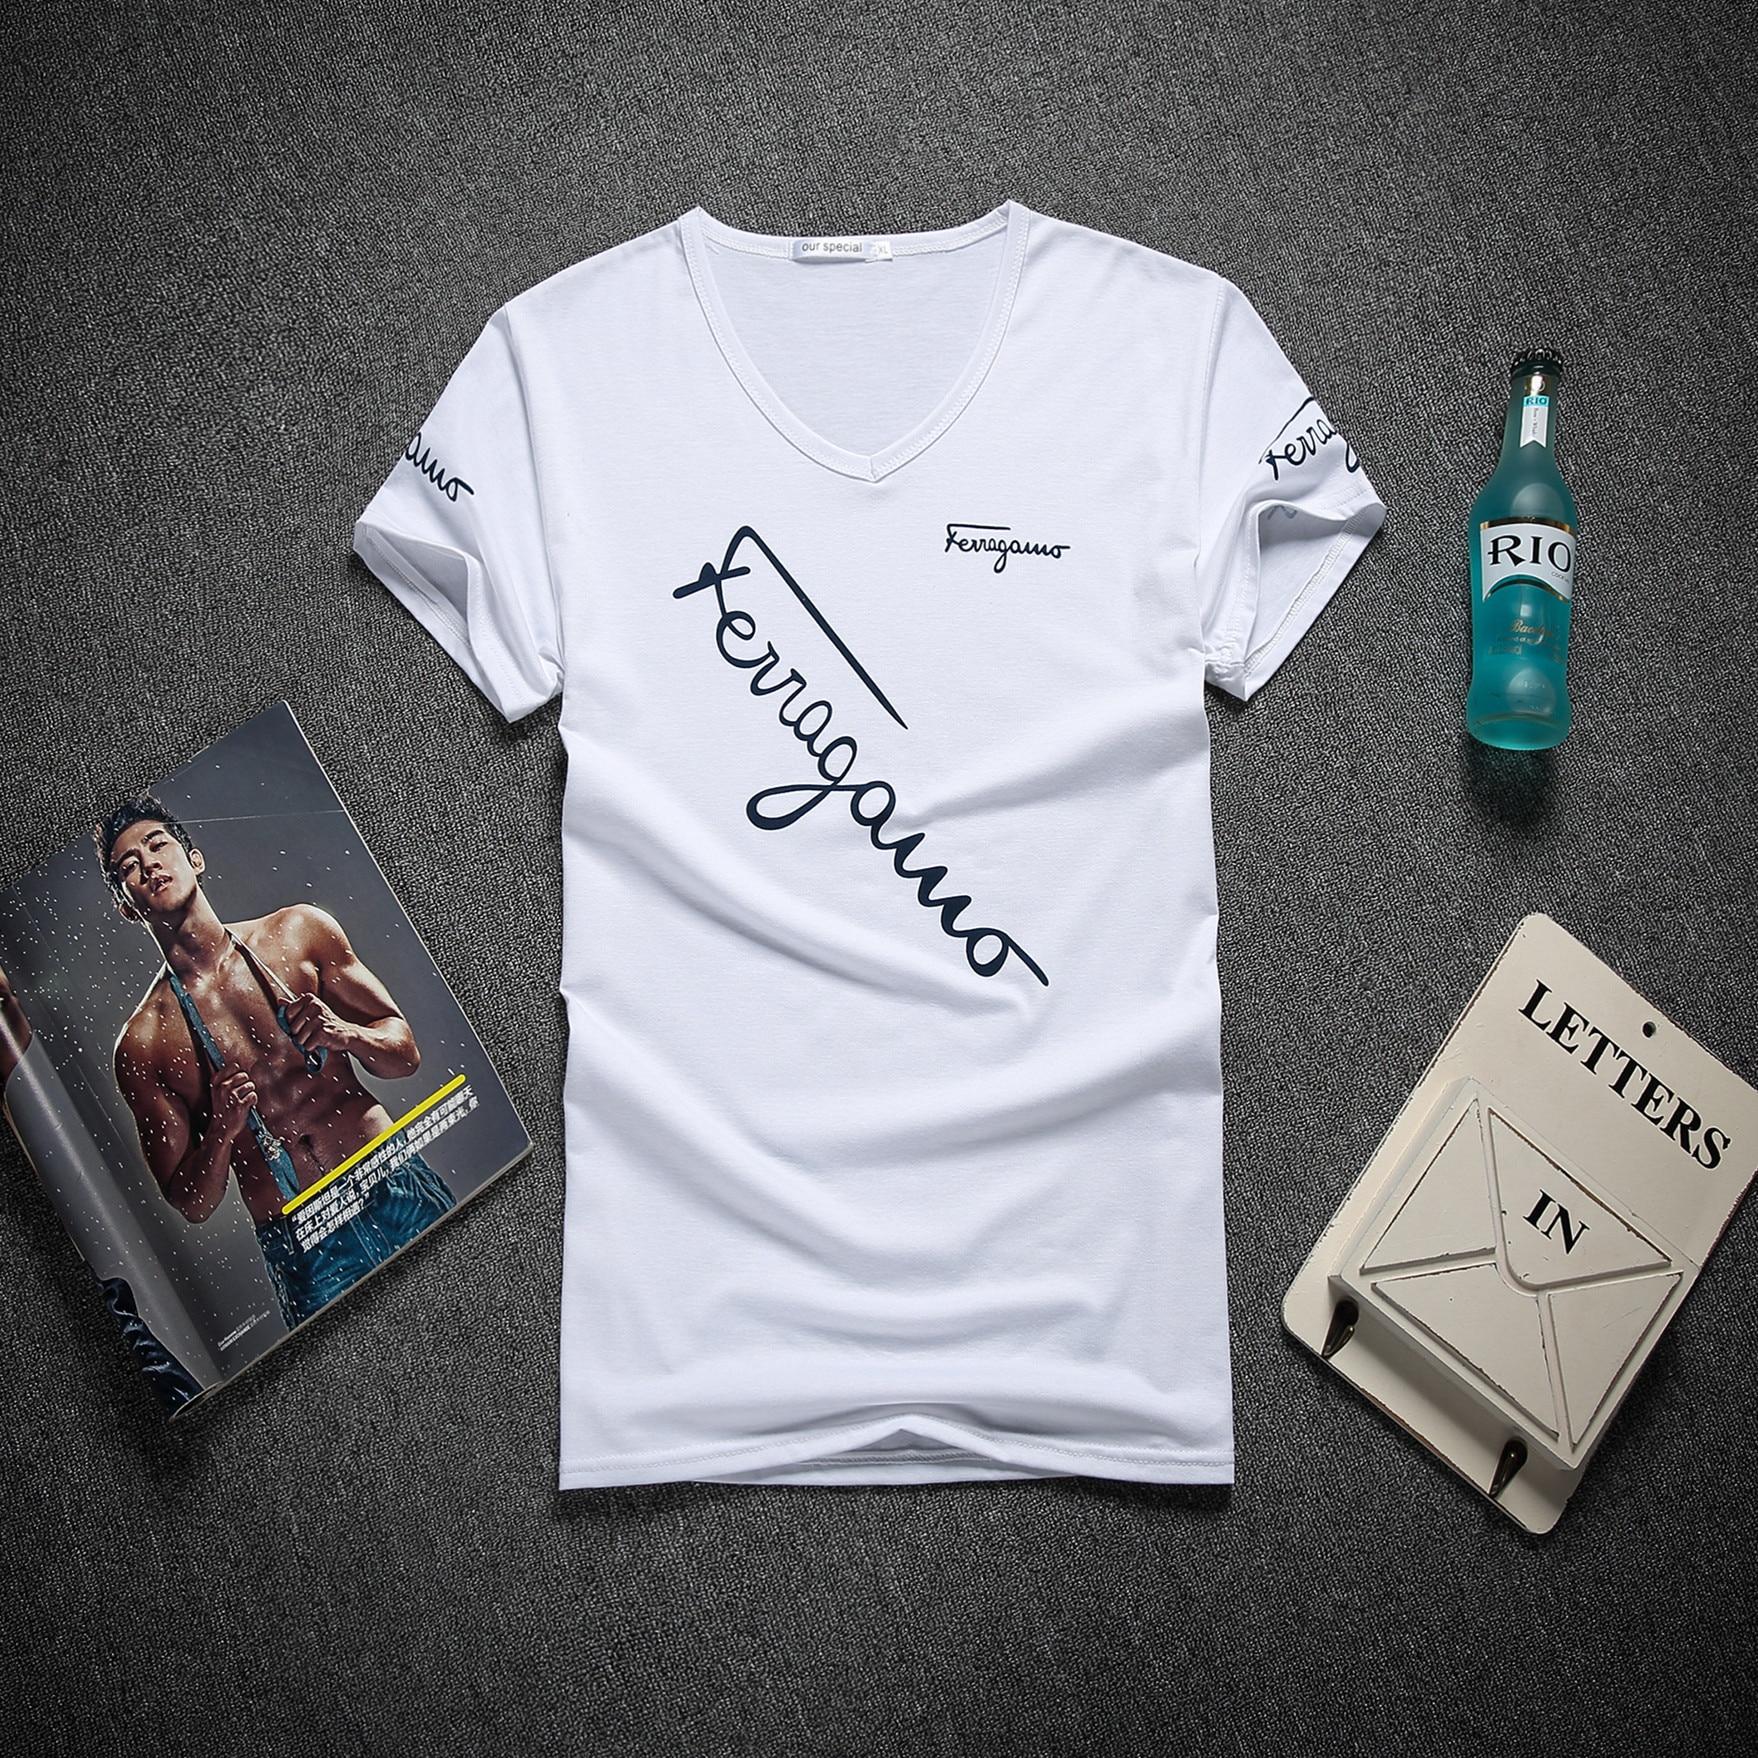 brand names clothing - photo #38